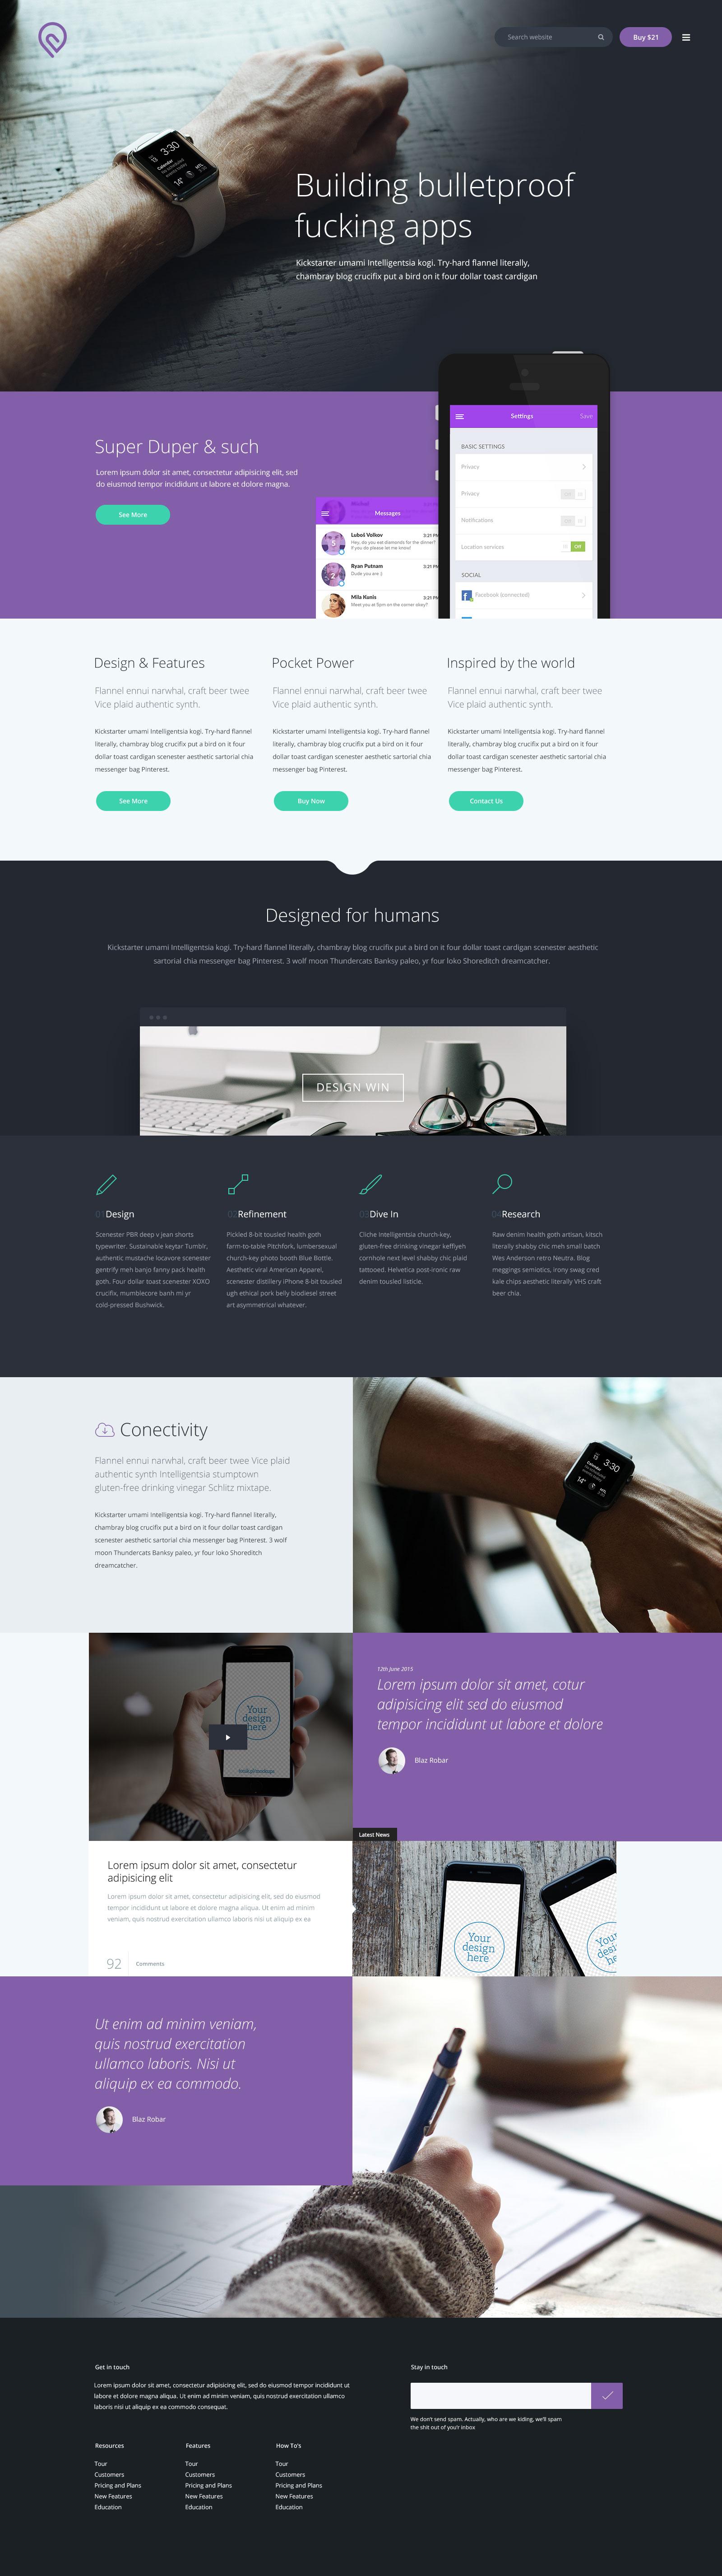 Tork - A Free Website Template | Free HTML5 Templates